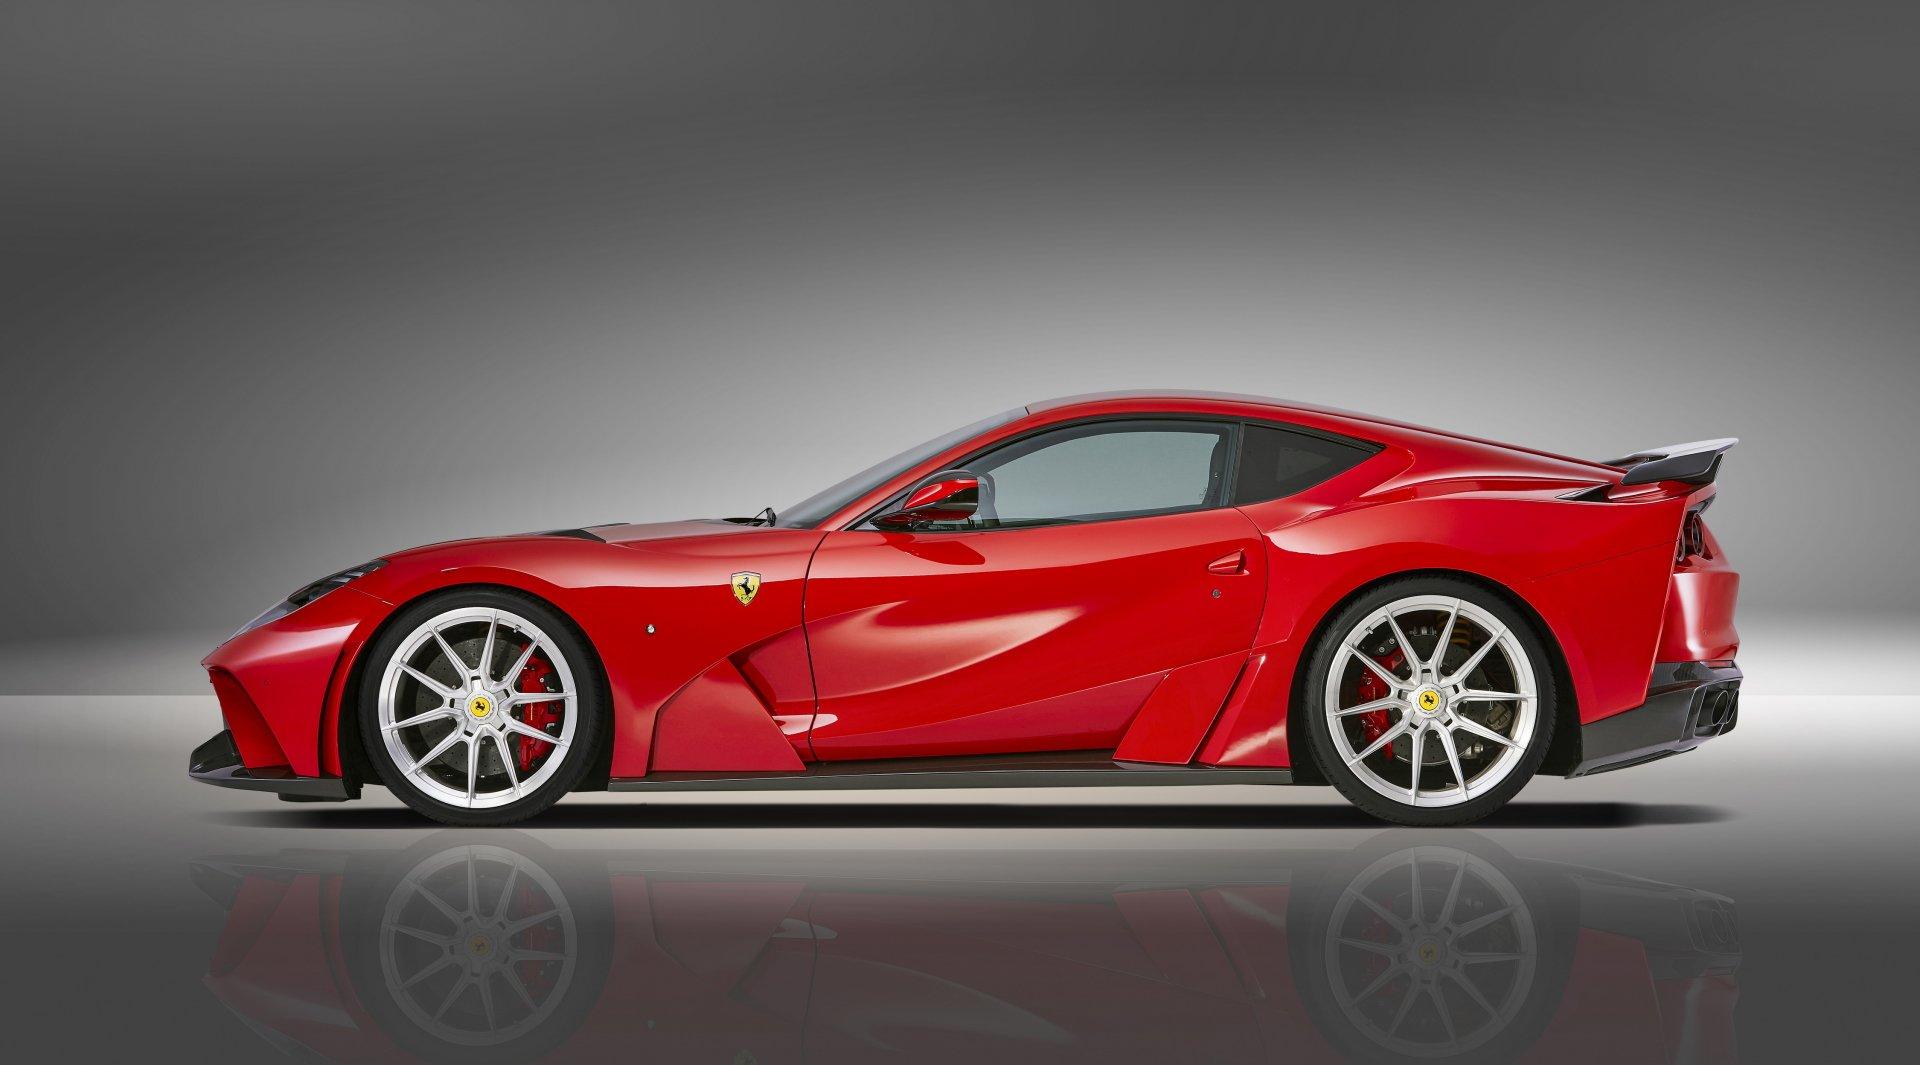 Ferrari 812 Superfast 4k Ultra HD Wallpaper | Background ...